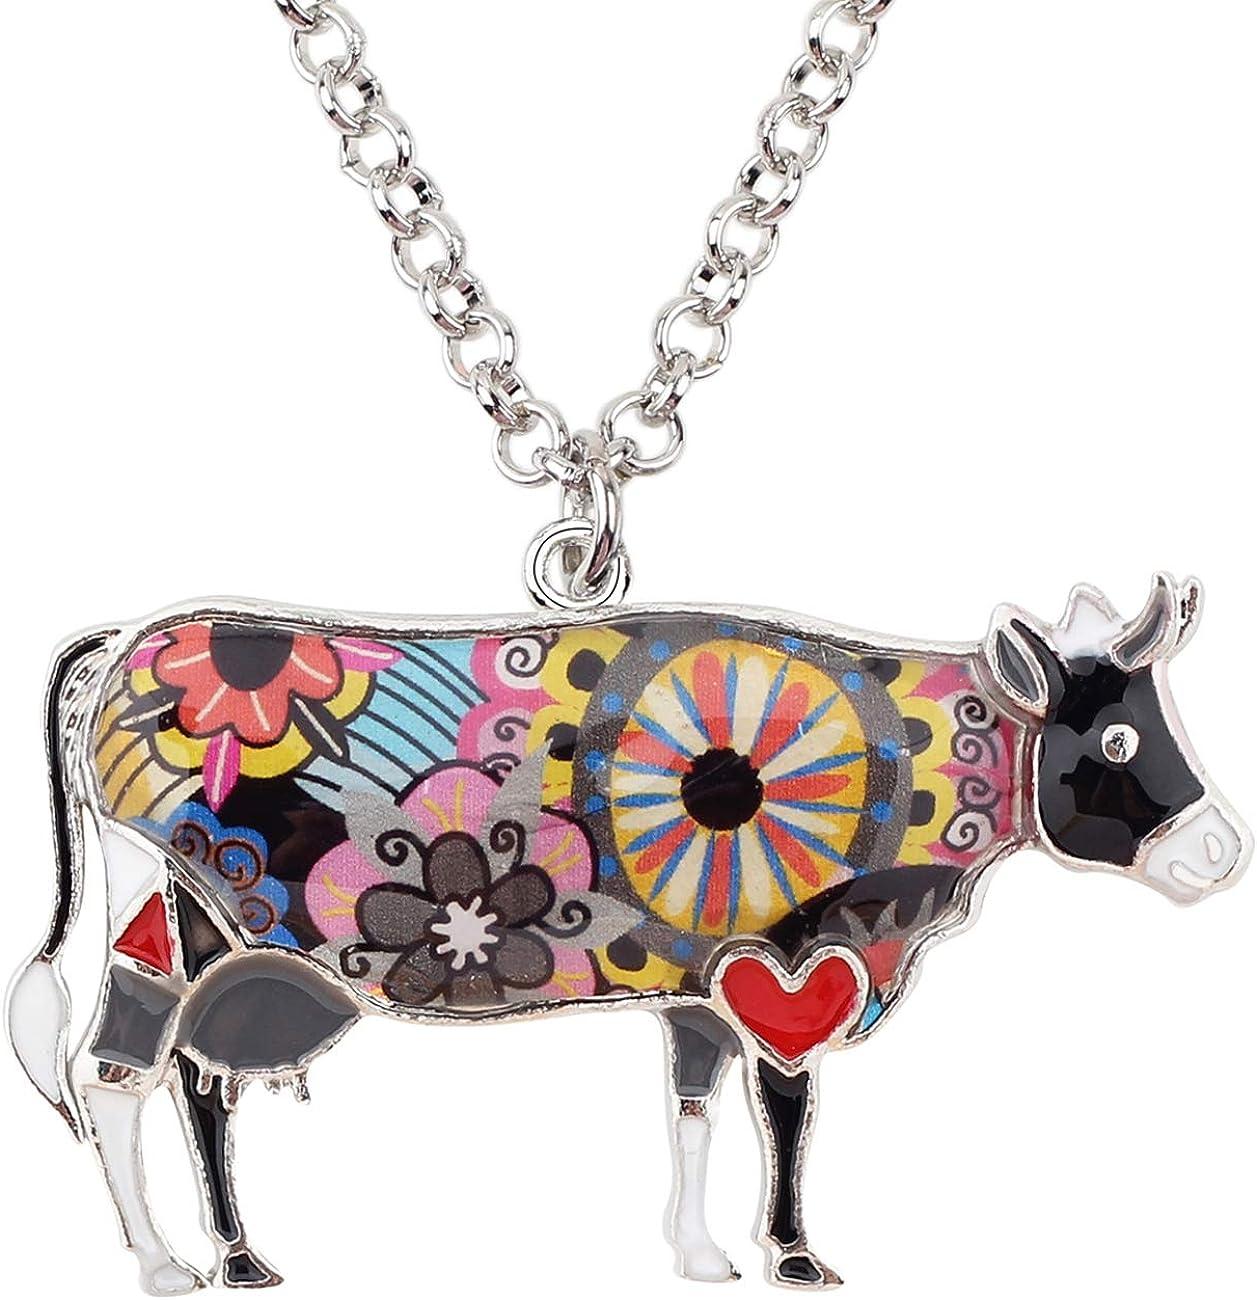 BONSNY Enamel Alloy Chain Farm Cow Necklaces Pendants for Women Kids Jewelry Cute Design